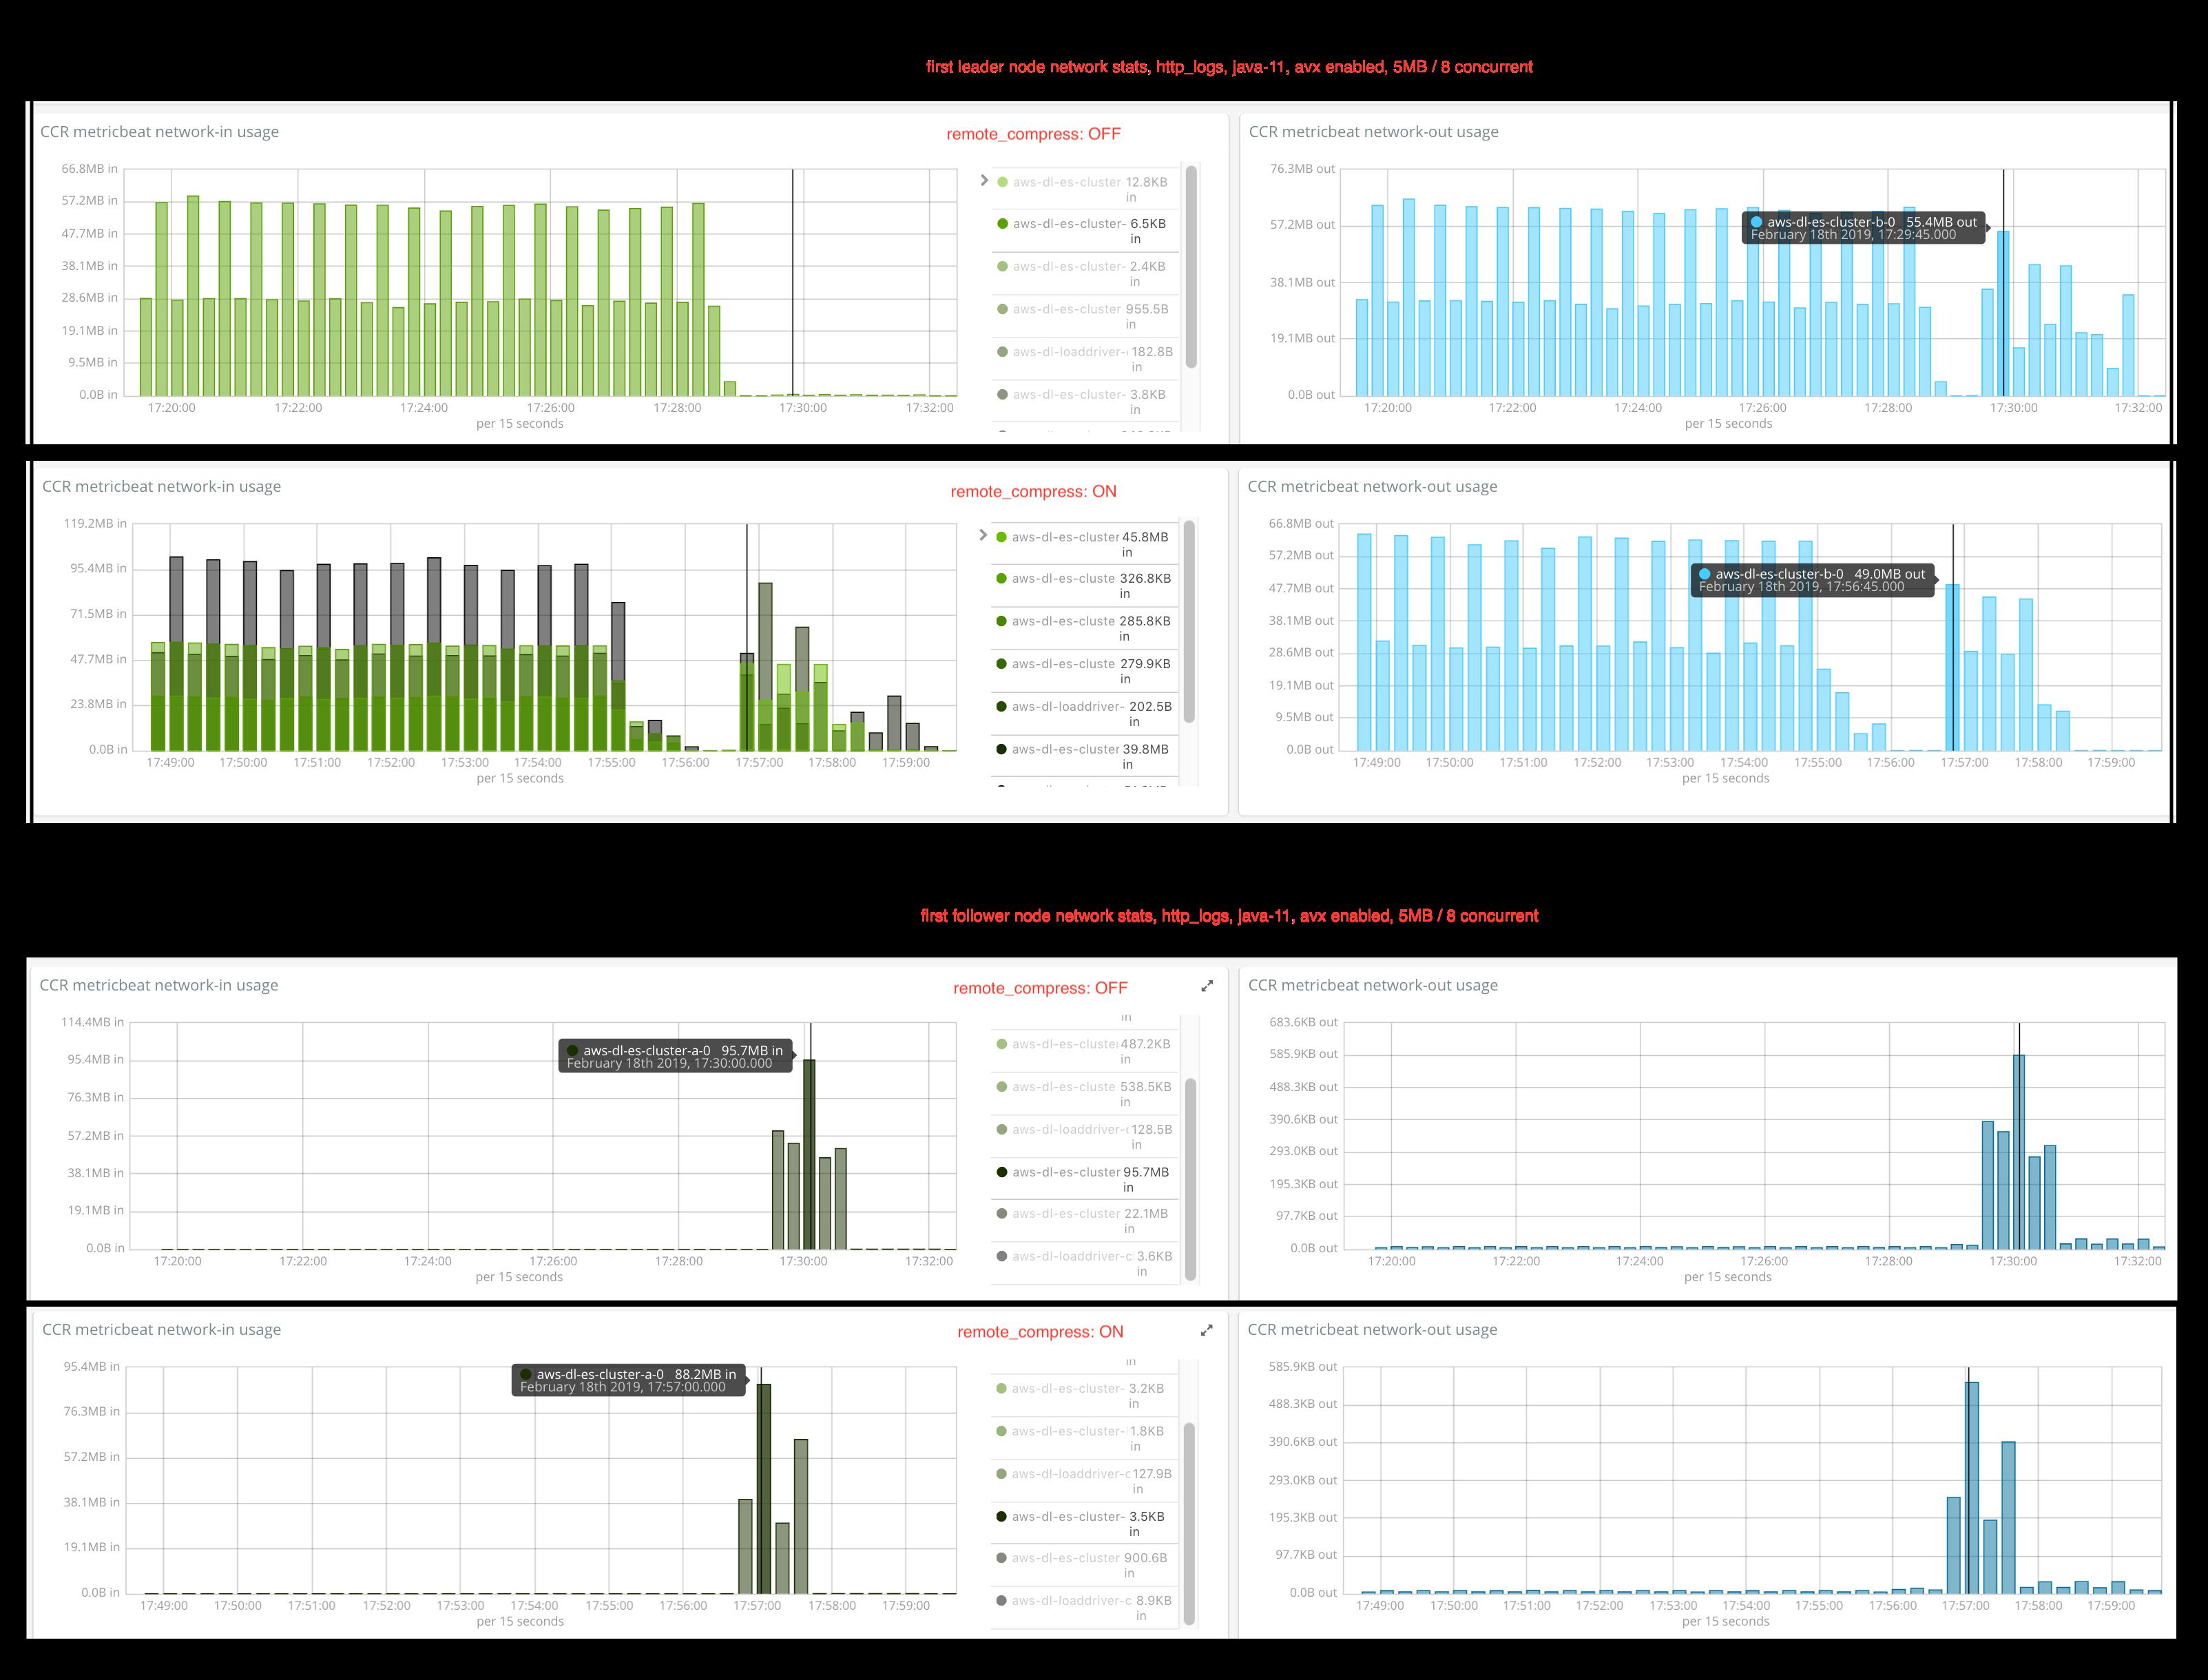 http_logs_per_node_comparison_java11_remote_compress_off_vs_on_5mb_8_chunks